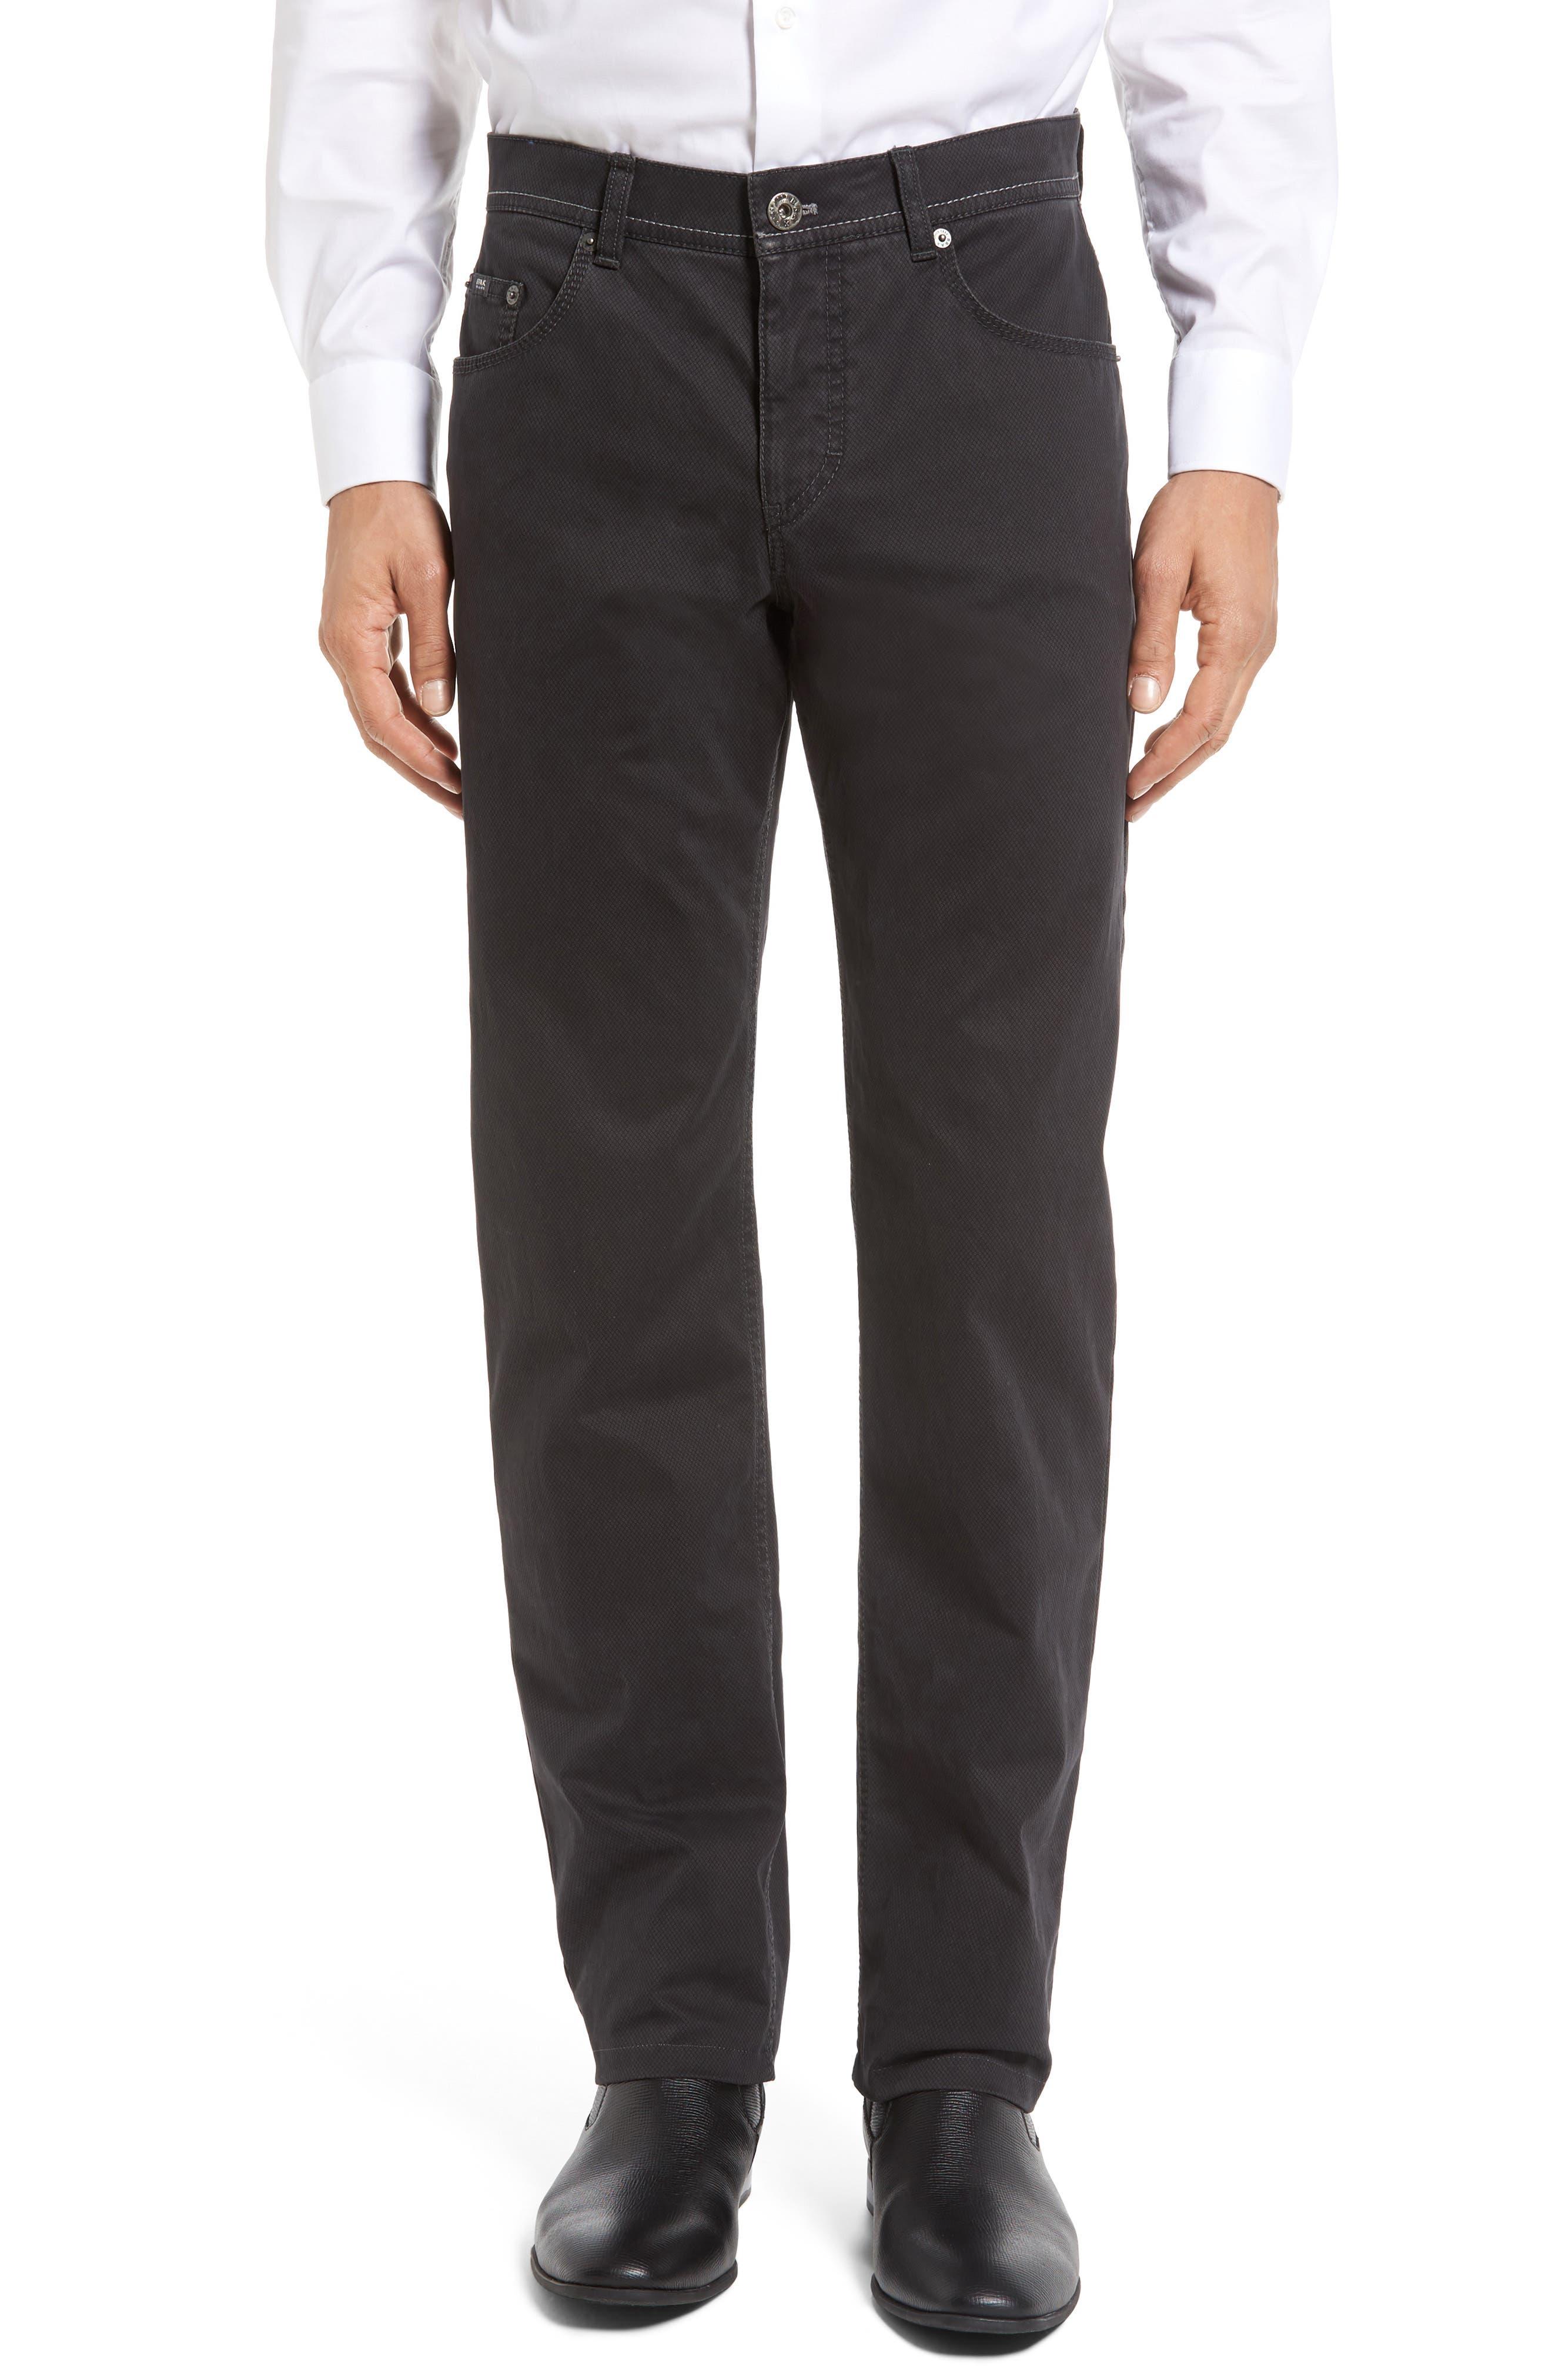 Brax Luxury Stretch Modern Fit Trousers